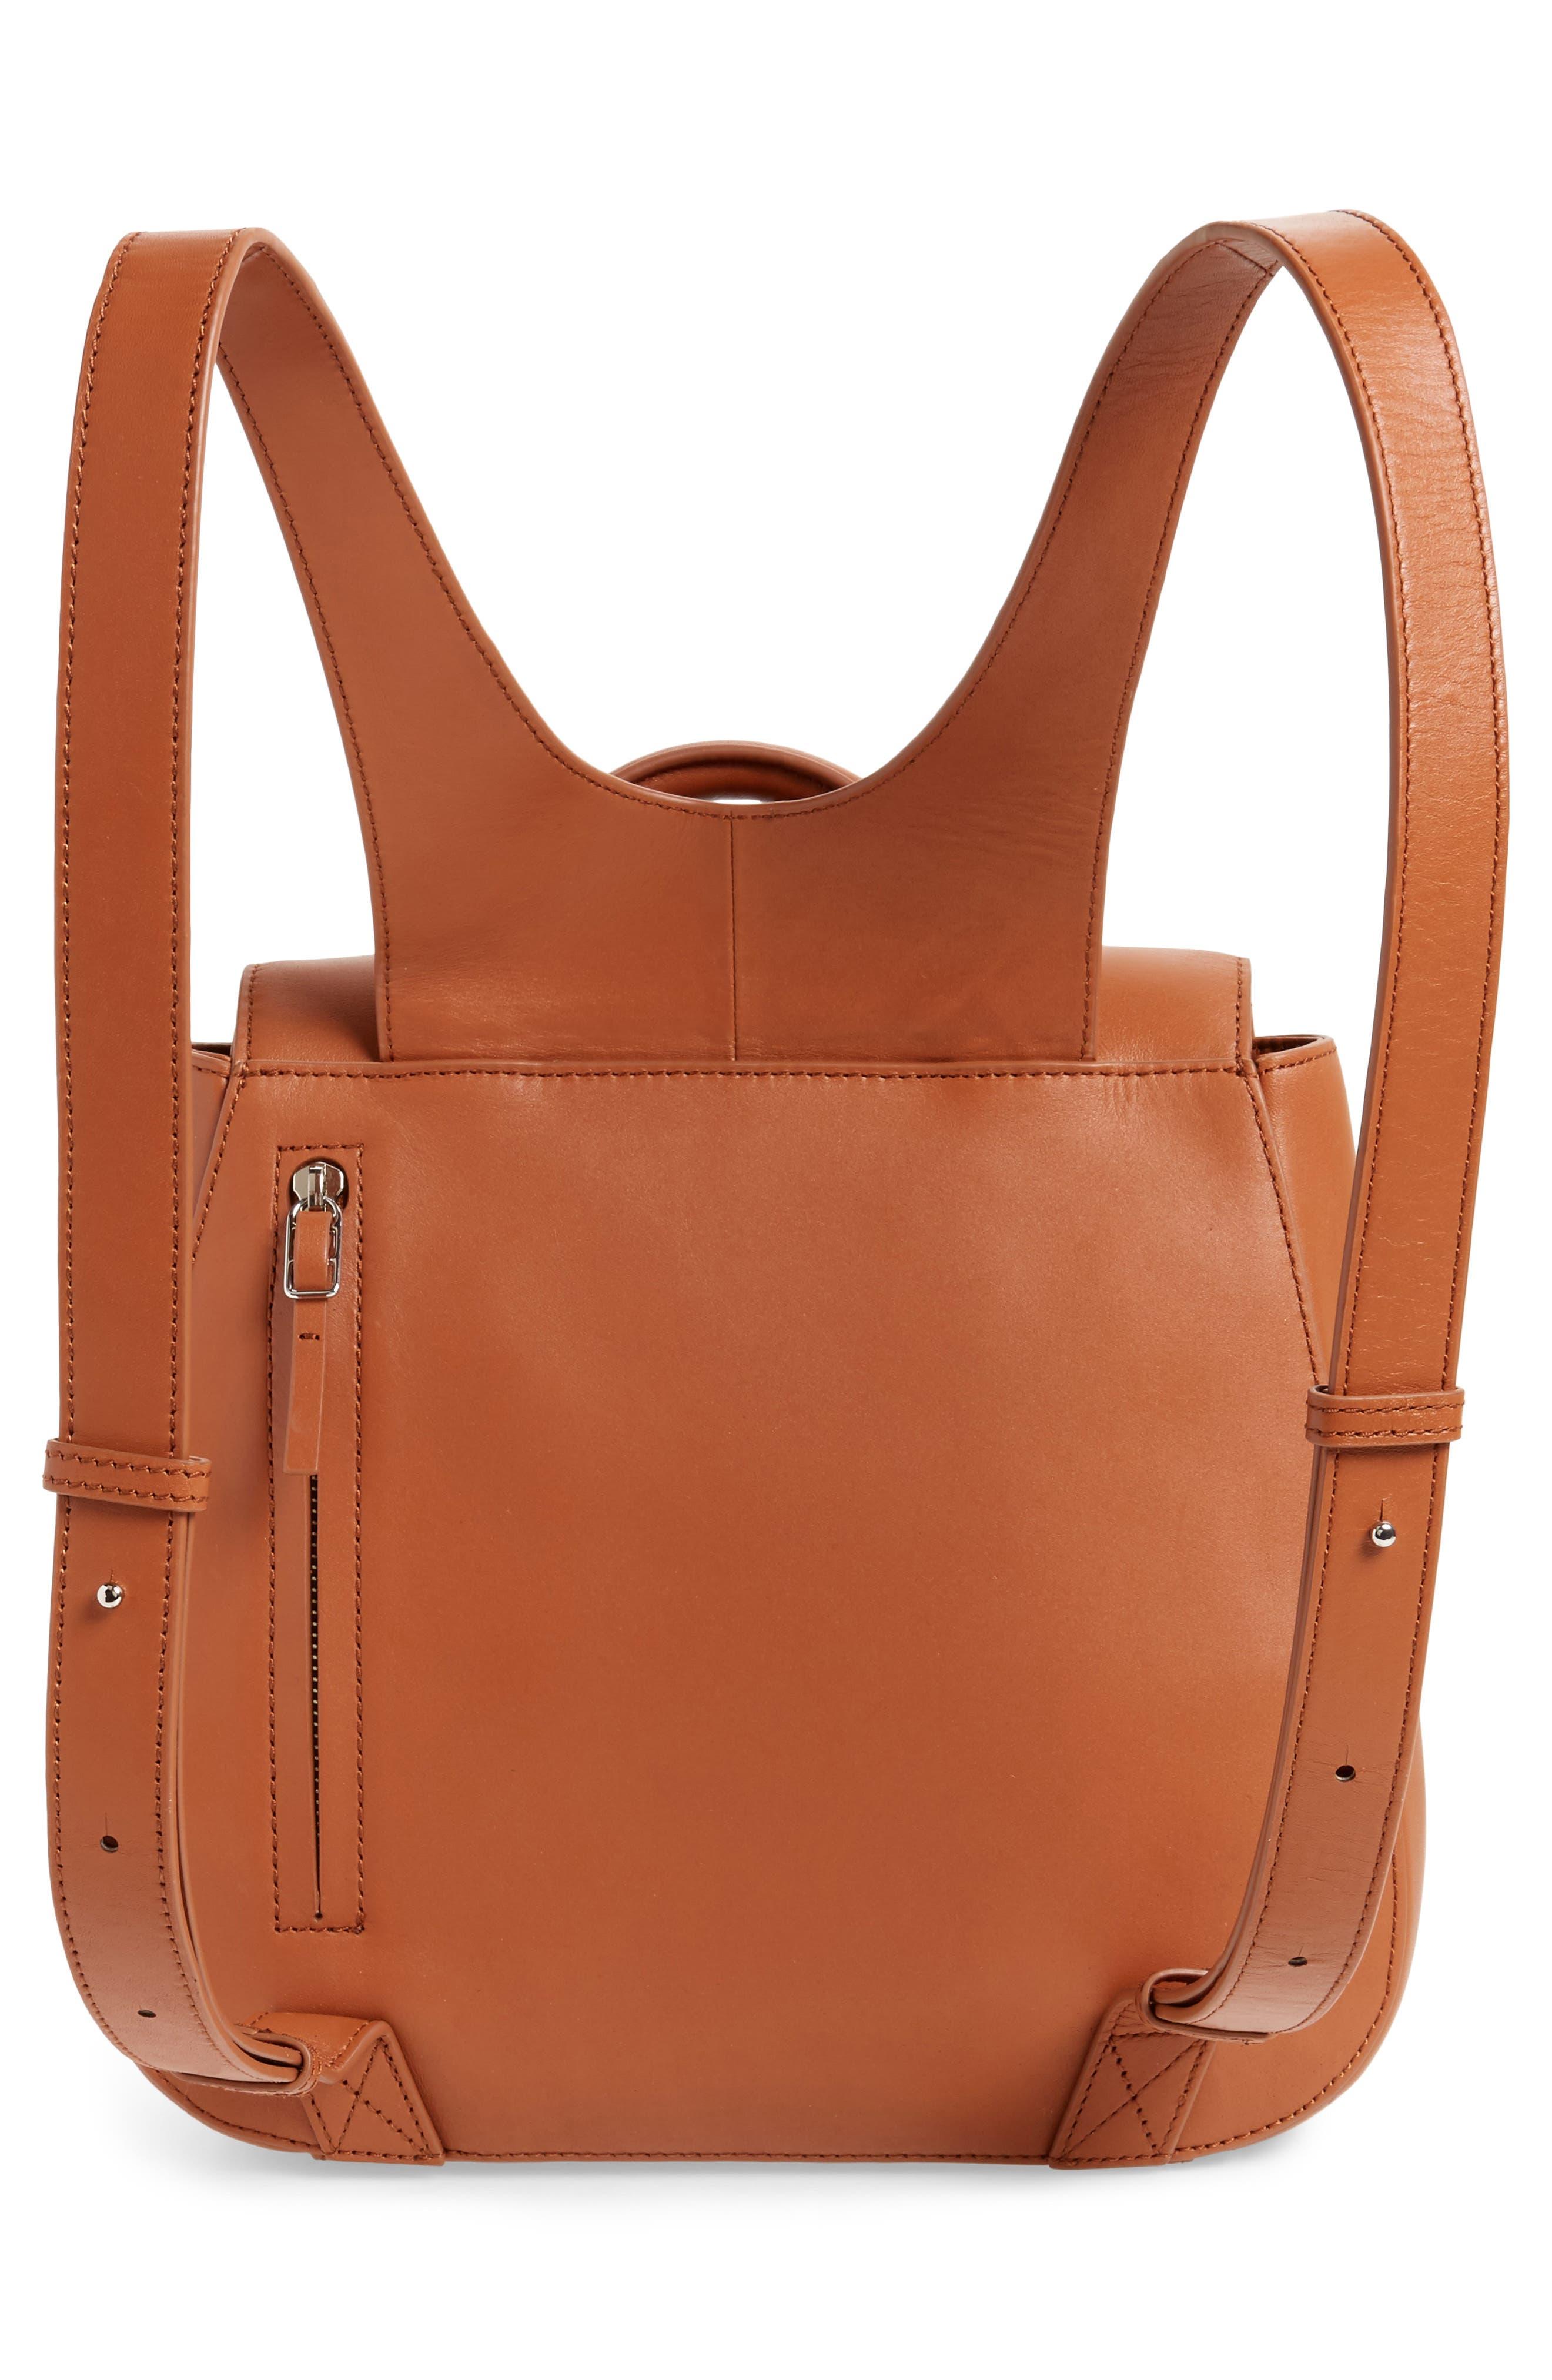 Kate Calfskin Leather Backpack,                             Alternate thumbnail 3, color,                             Saddle